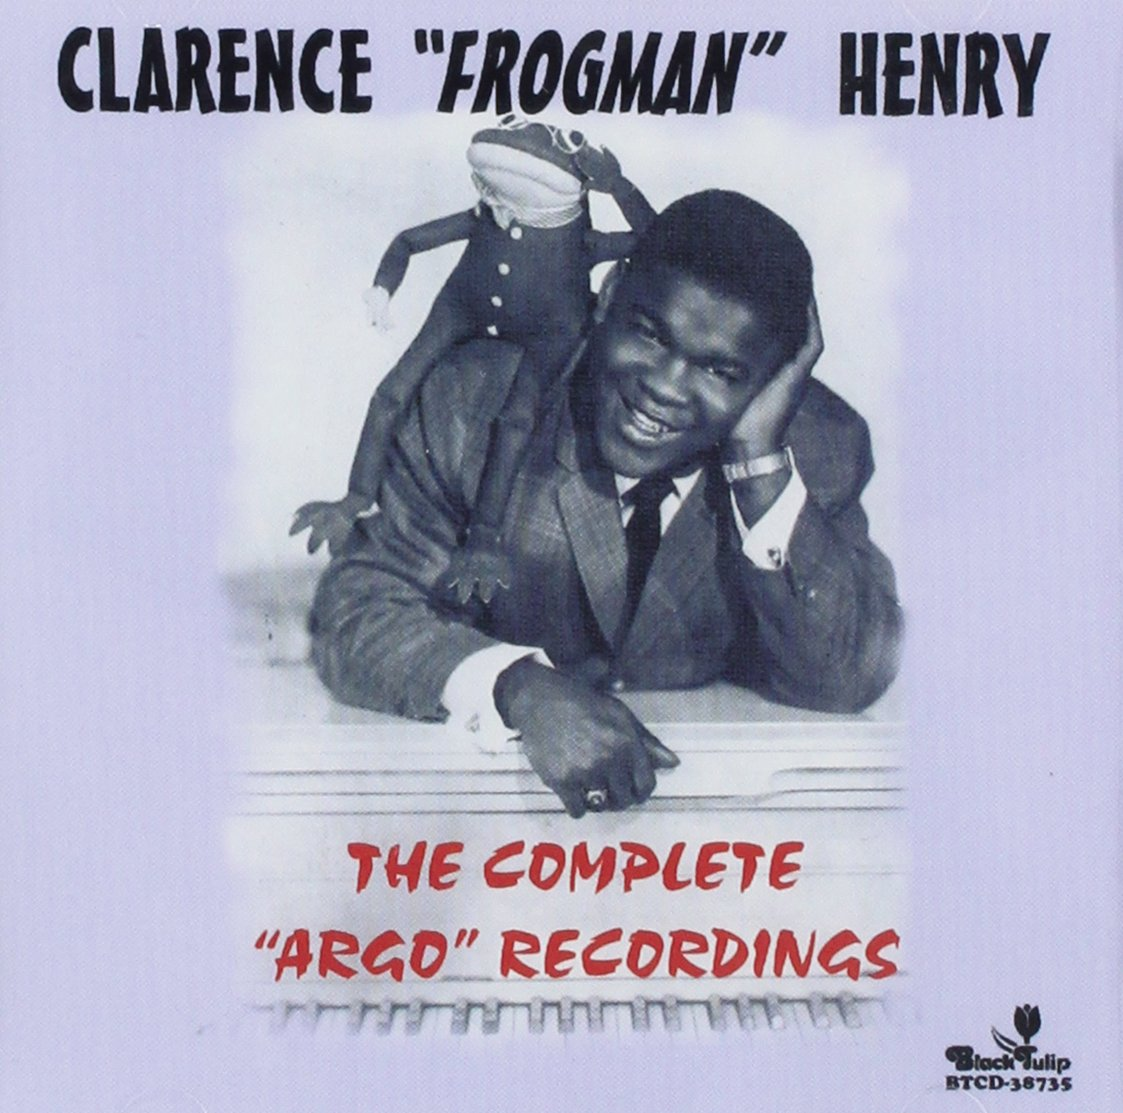 Complete Argo Recordings                                                                                                                                                                                                                                                    <span class=